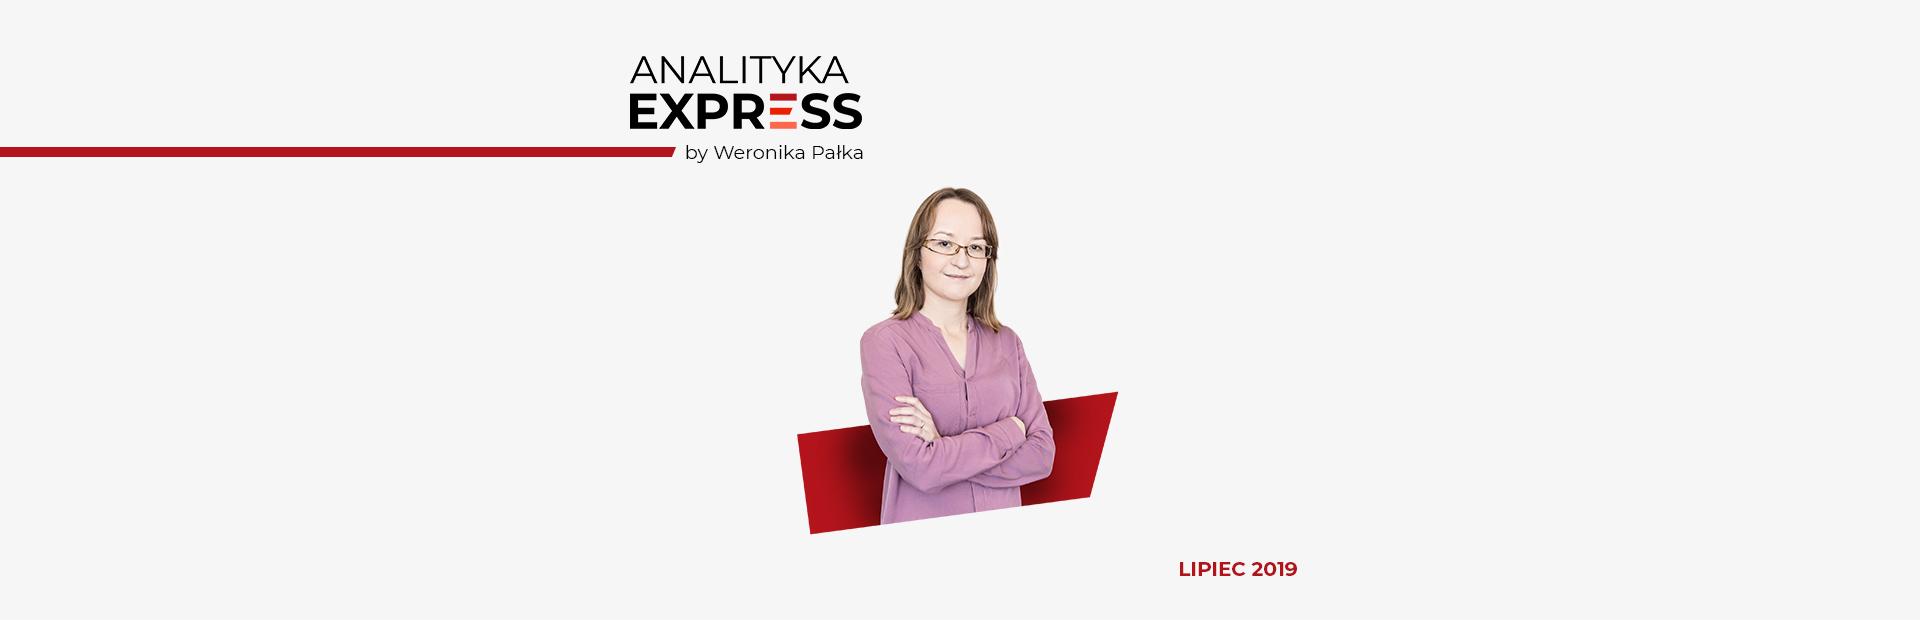 Analityka Express 7/2019